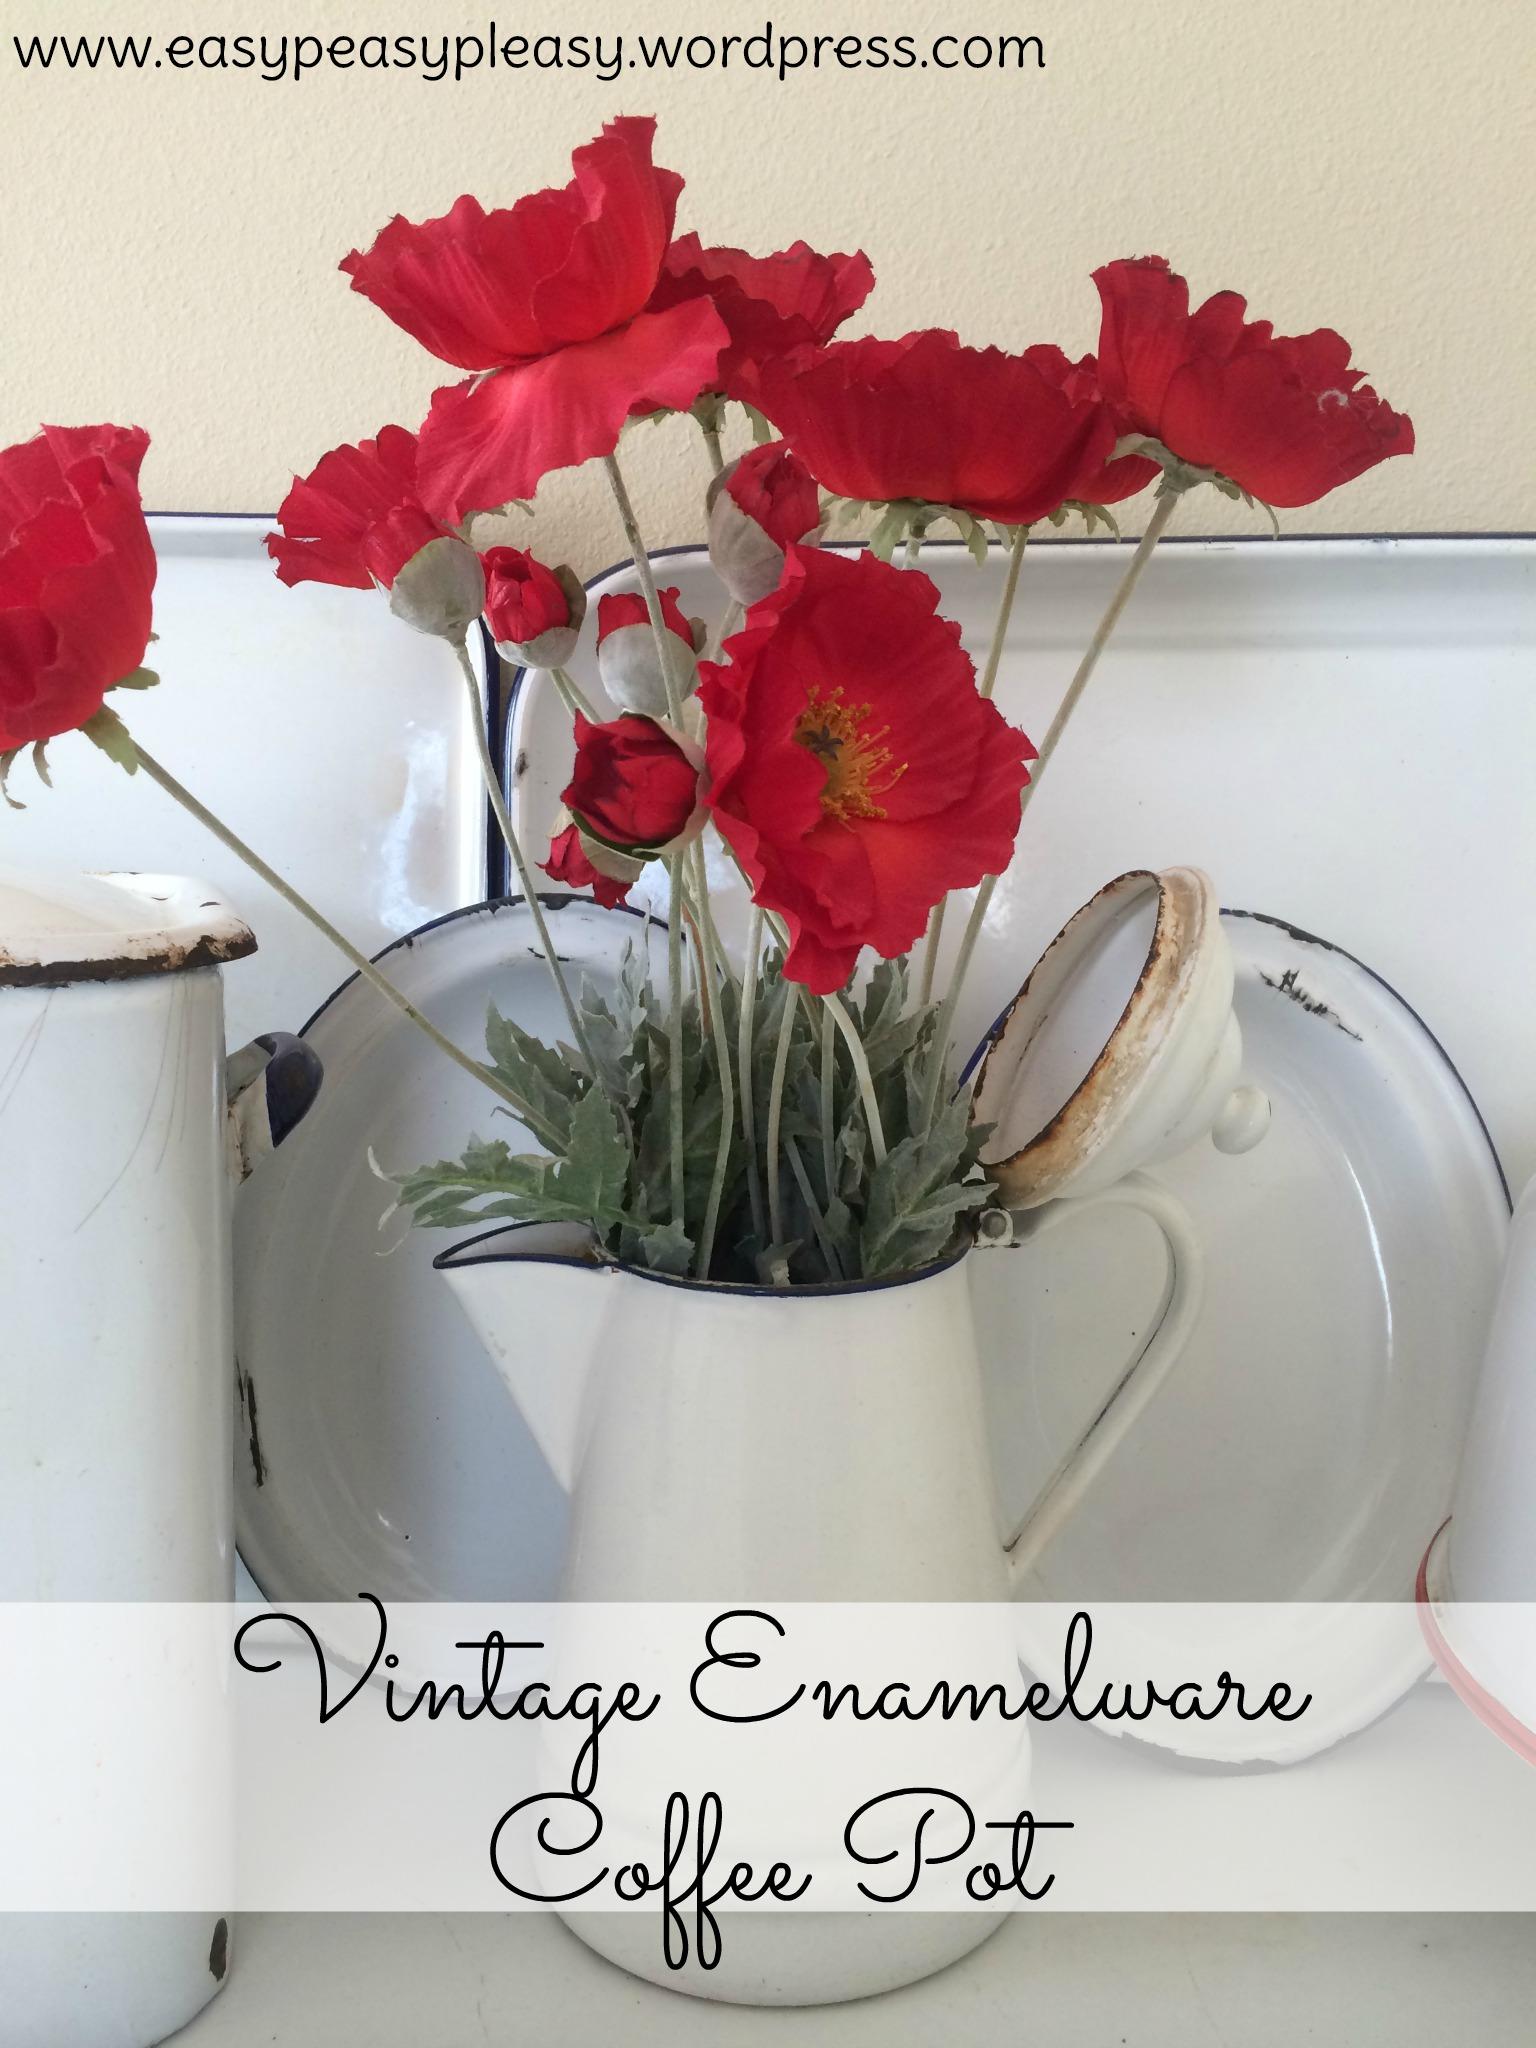 Vintage Enamelware Coffee Pot turned into a vase at https://easypeasypleasy.com